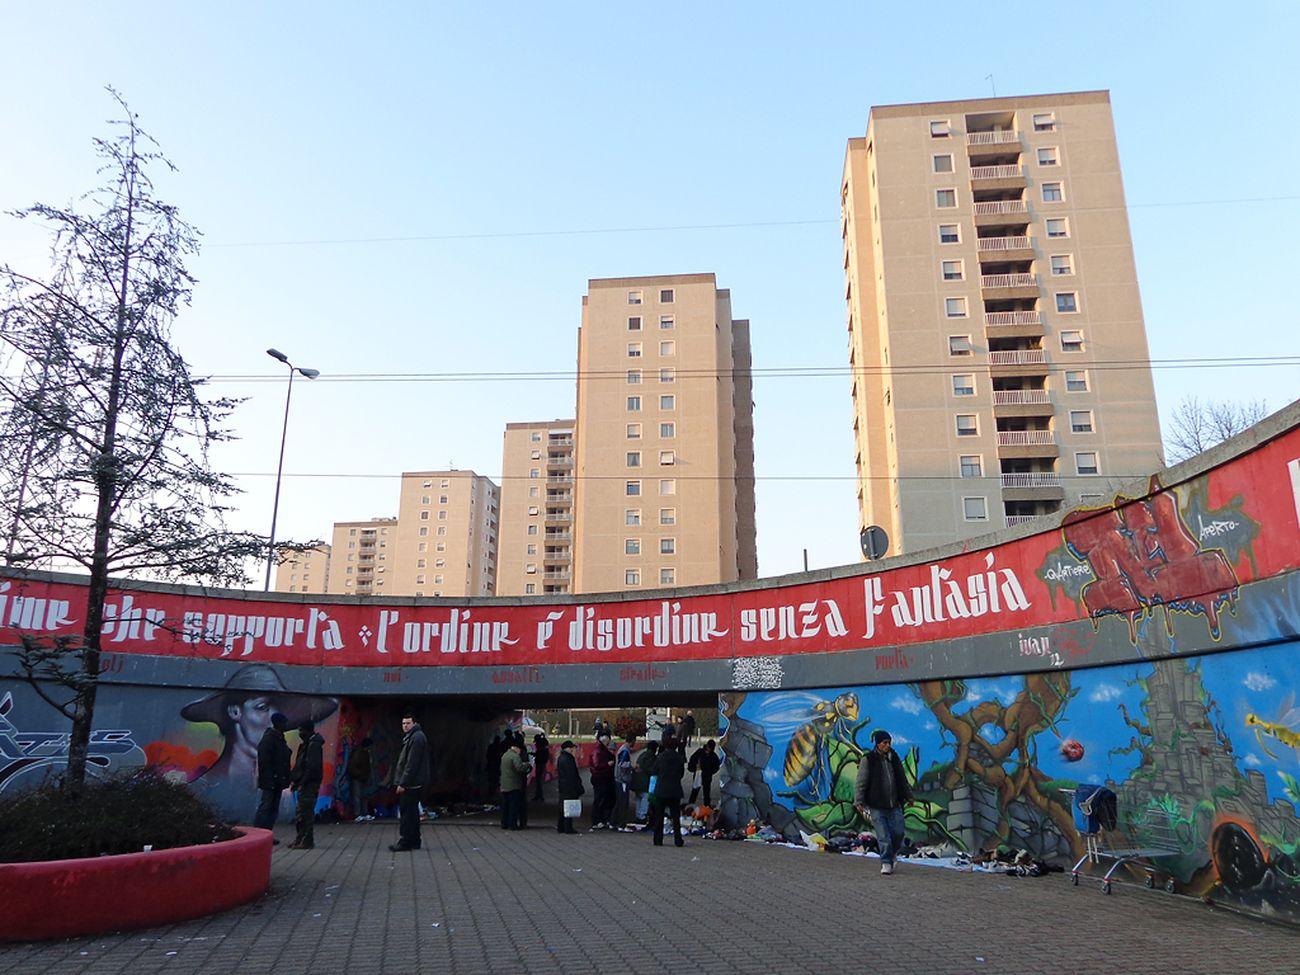 Carlo Aymonino, quartiere Gallaratese, Milano, vista dal sottopasso di Bonola, 2013. Photo Arbalete CC BY SA 3.0 via Wikimedia